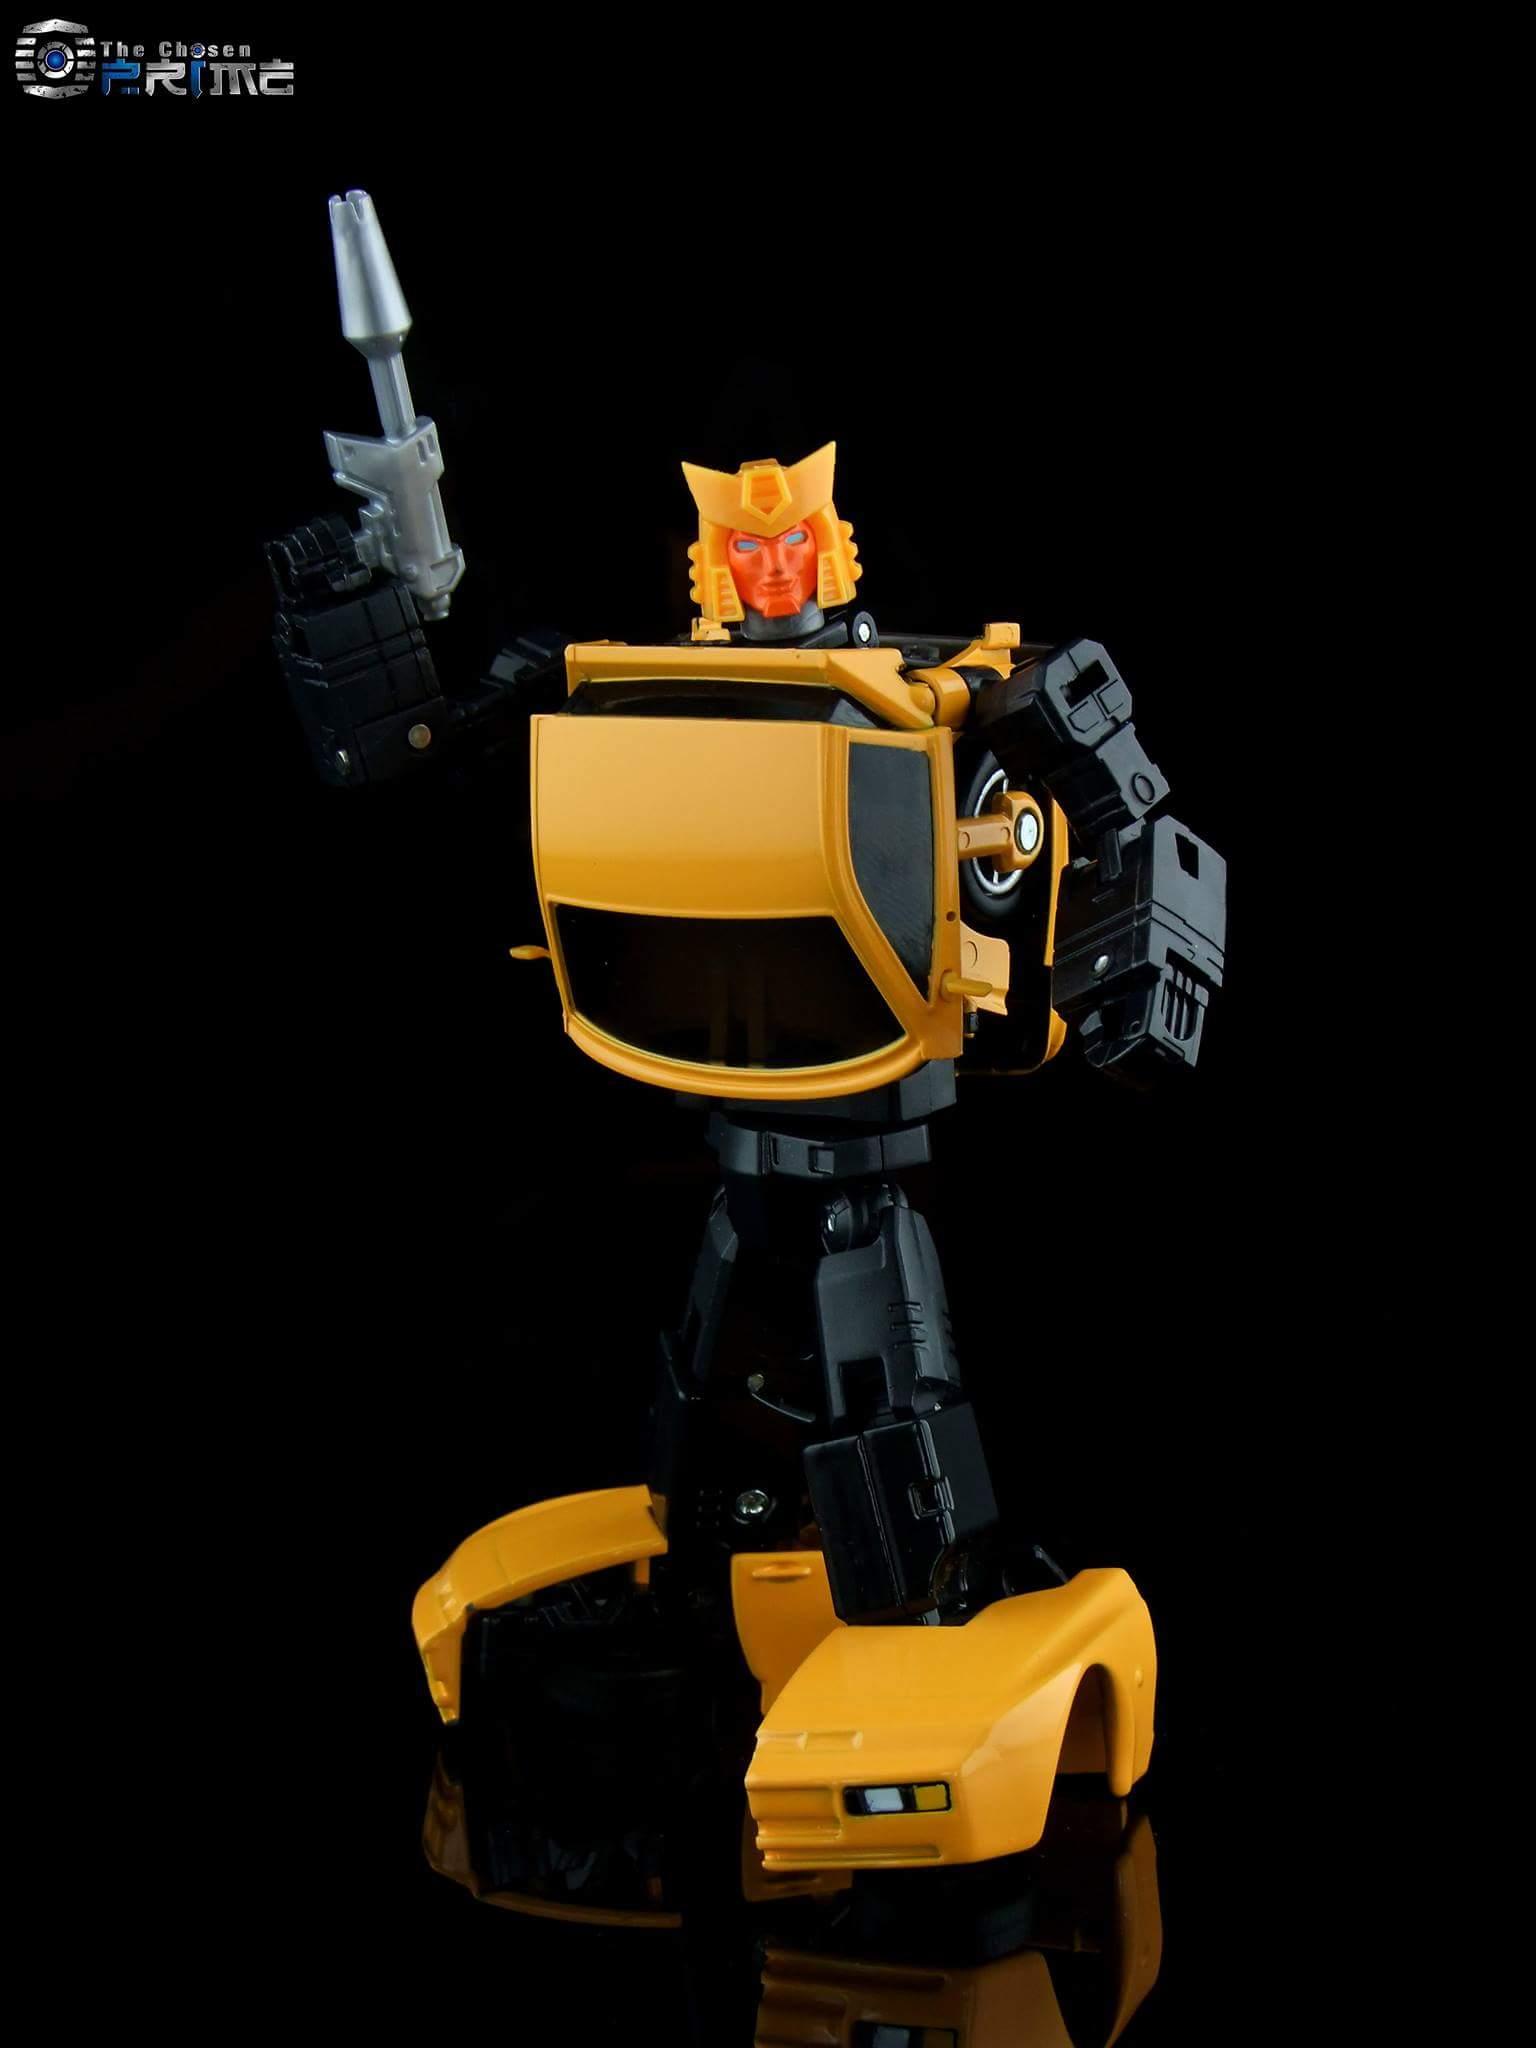 [ACE Collectables] Produit Tiers - Minibots MP - ACE-01 Tumbler (aka Cliffjumper/Matamore), ACE-02 Hiccups (aka Hubcap/Virevolto), ACE-03 Trident (aka Seaspray/Embruns) QTFspcof